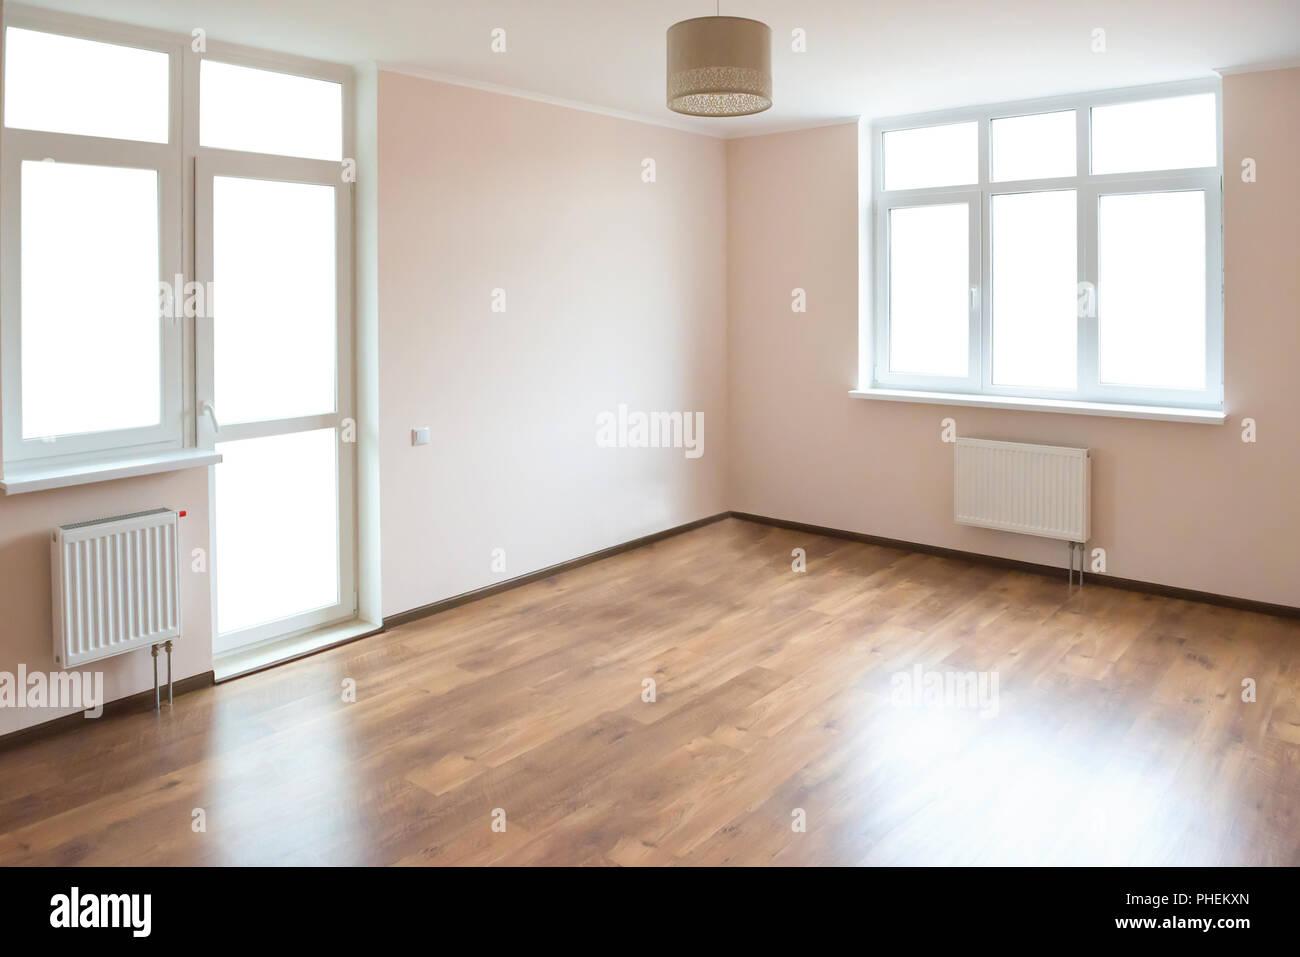 Empty room with white windows - Stock Photo